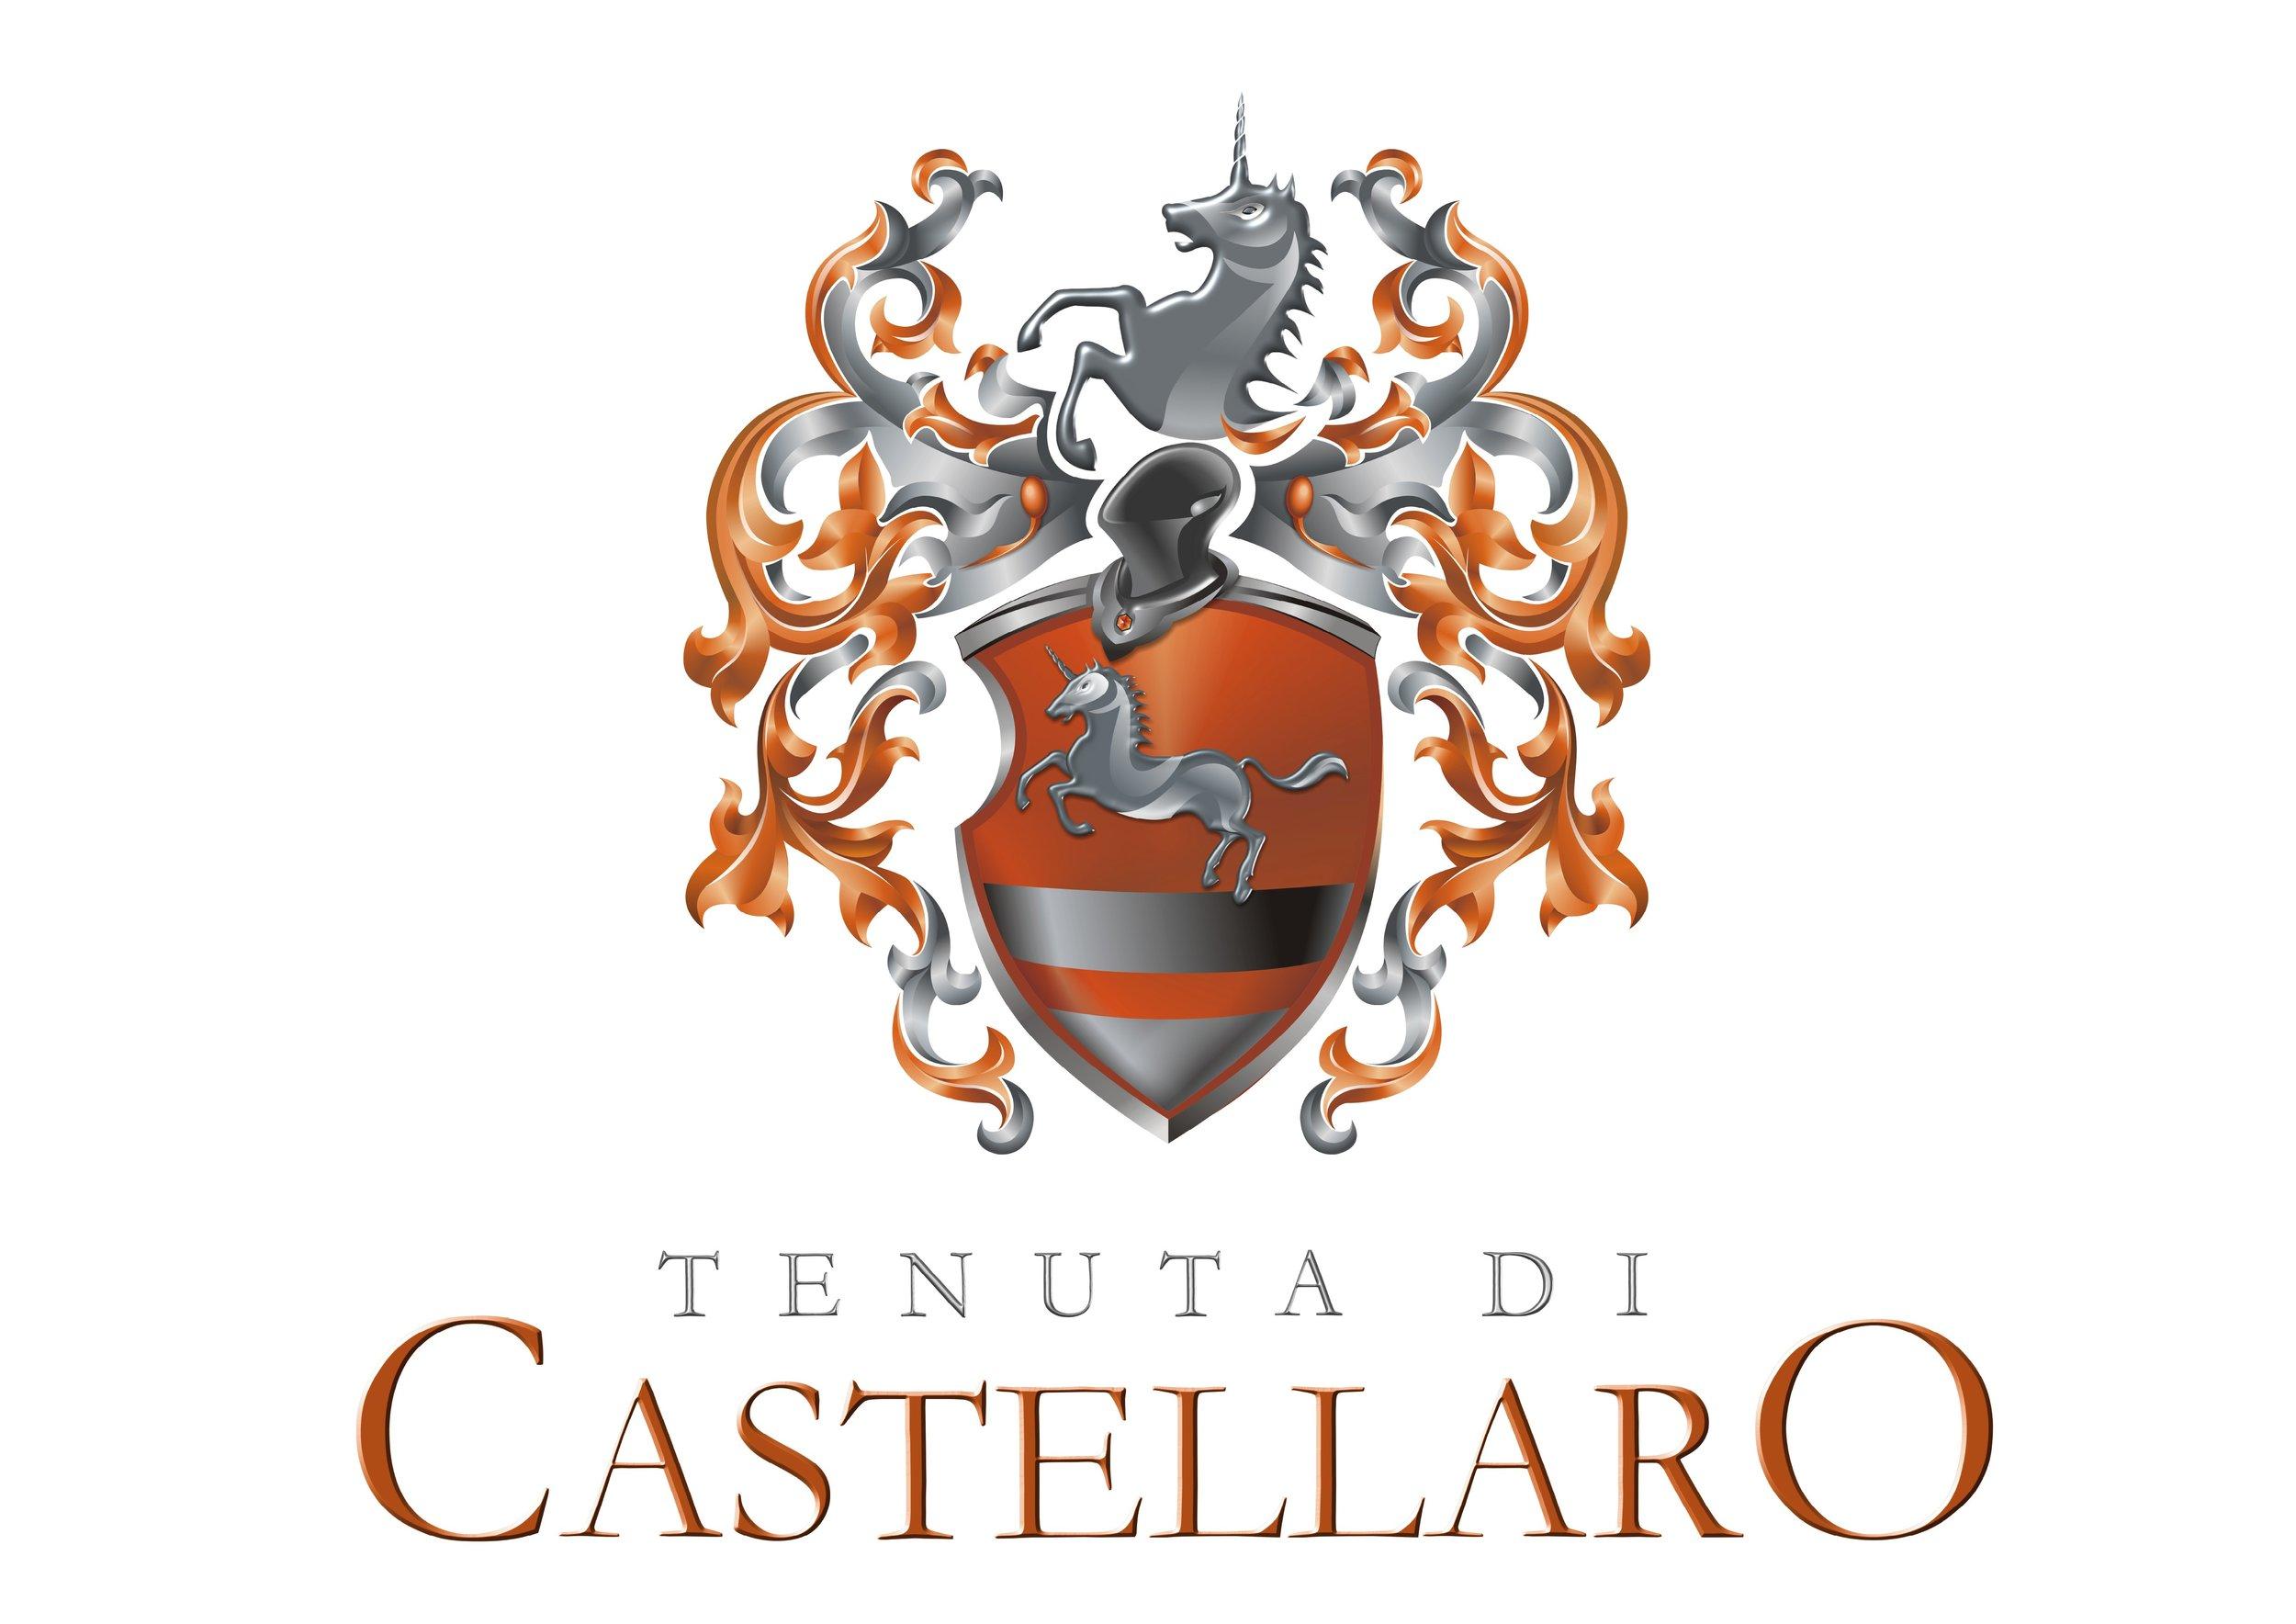 Tenuta di Castellaro.jpg